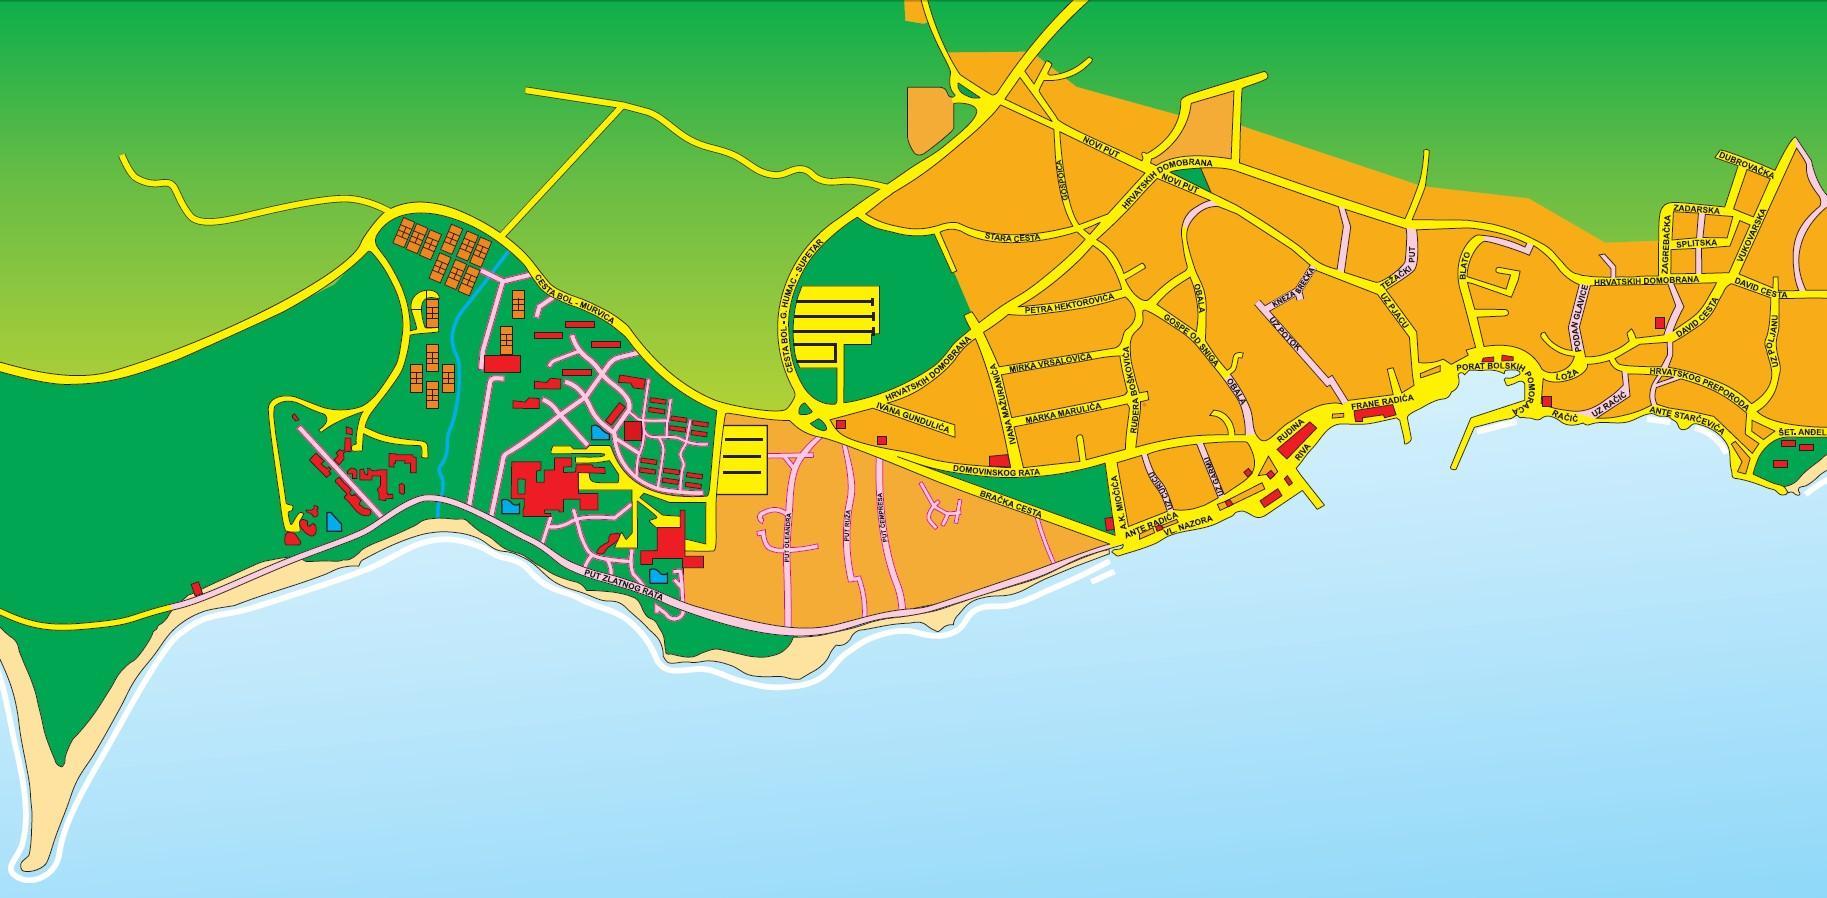 kart over brac Brac, kroatia kart   Kart over brac, kroatia (Sør Europa   Europa) kart over brac